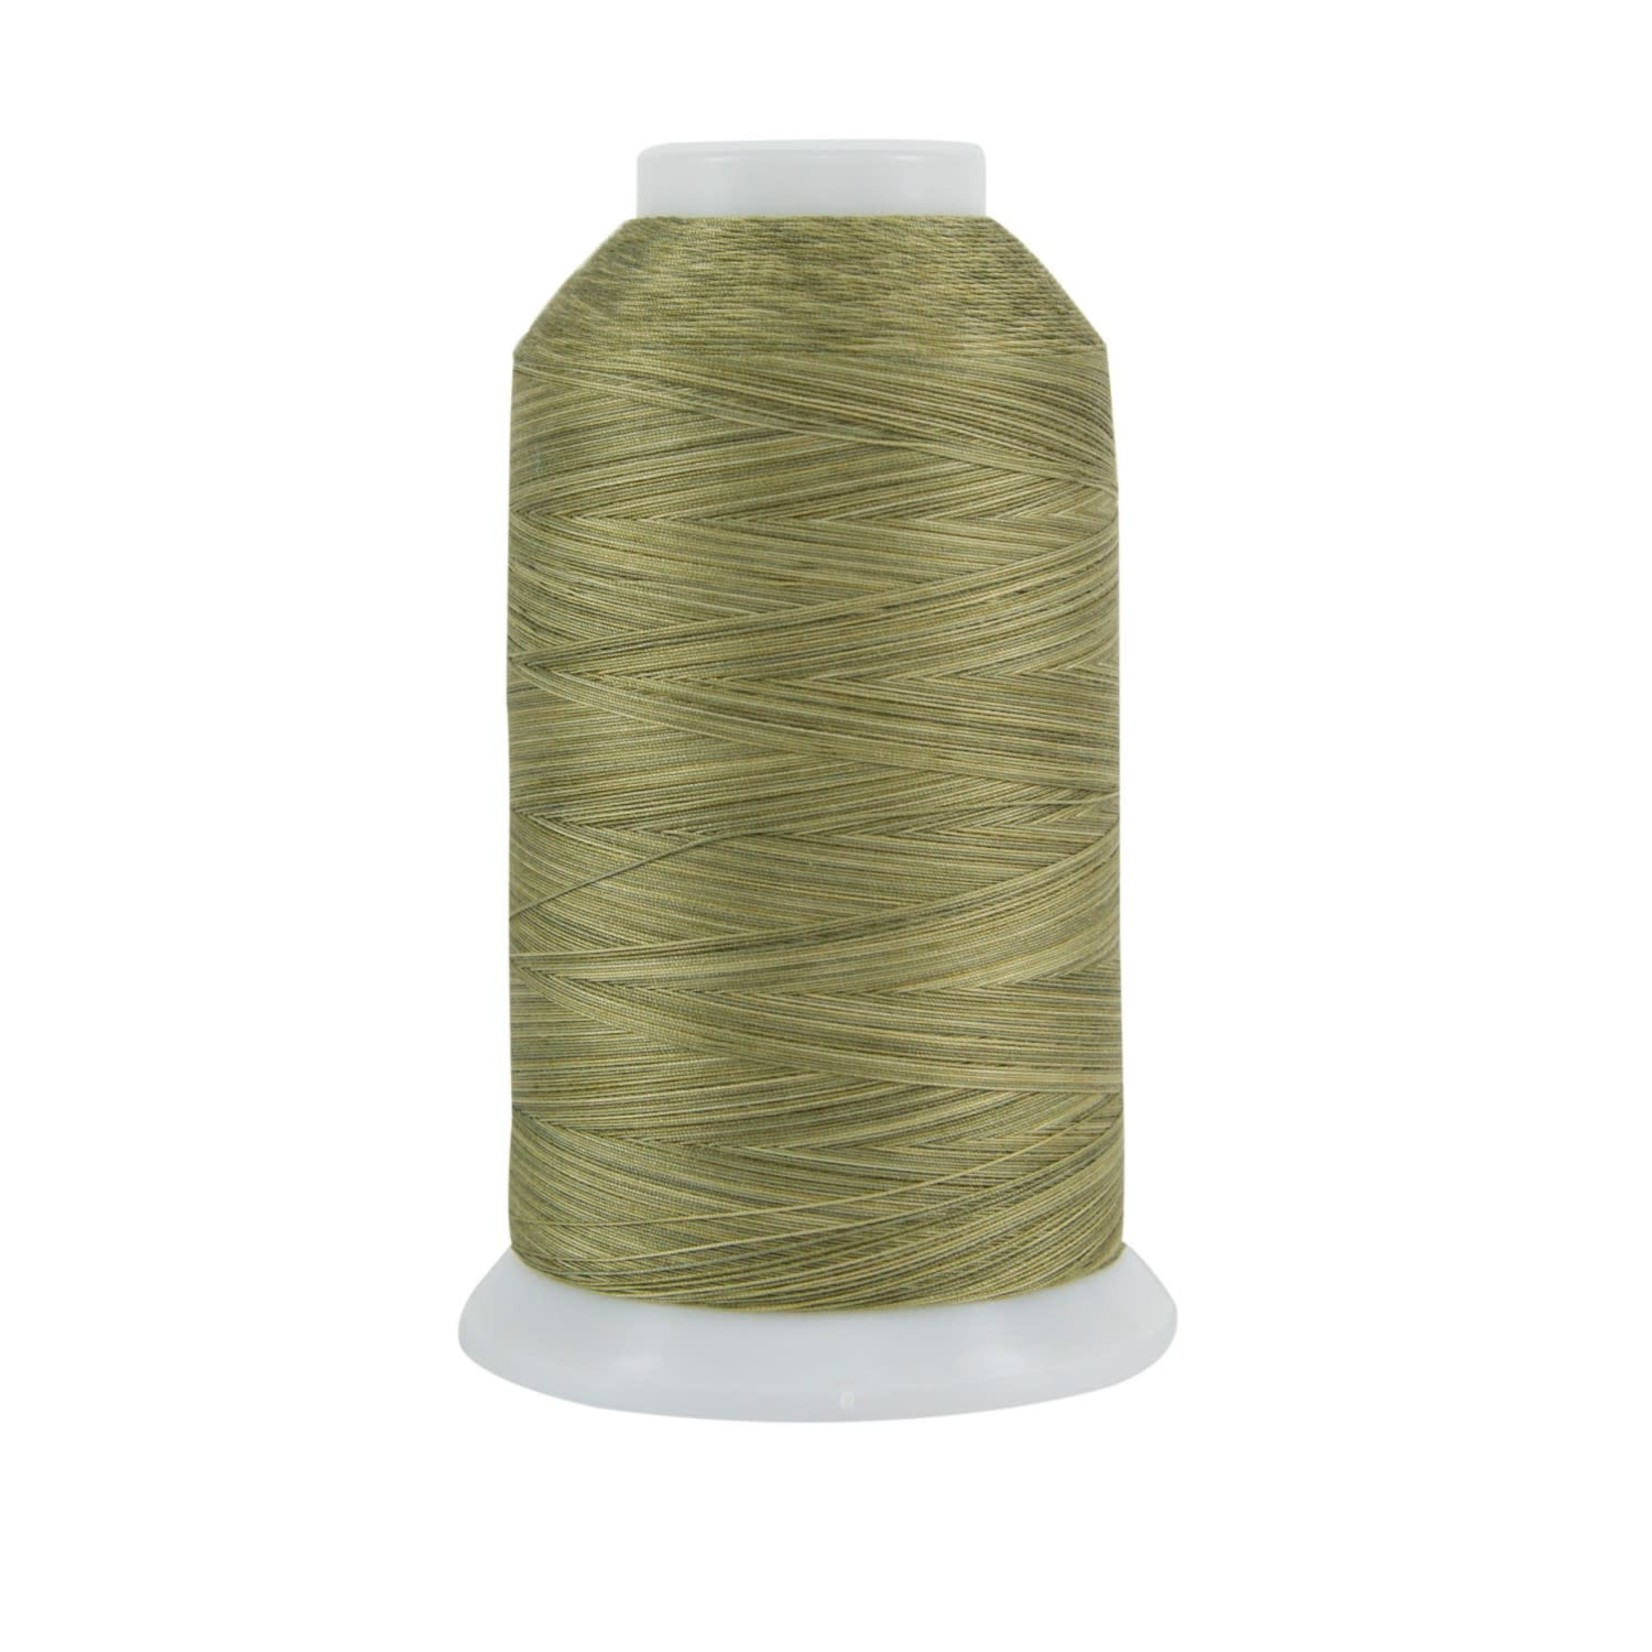 Superior Threads King Tut - #40 - 1828 m - 0968 Fig